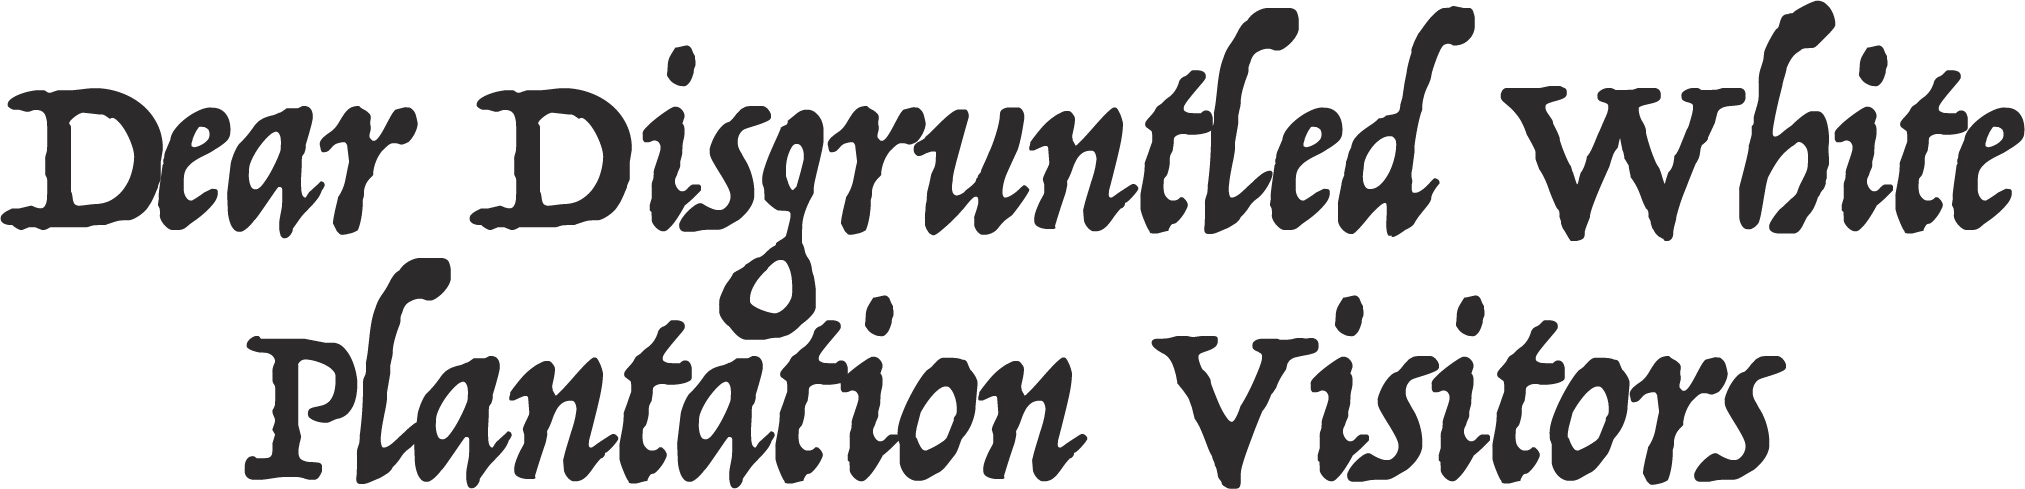 dear-white-plantation-visitors-.png